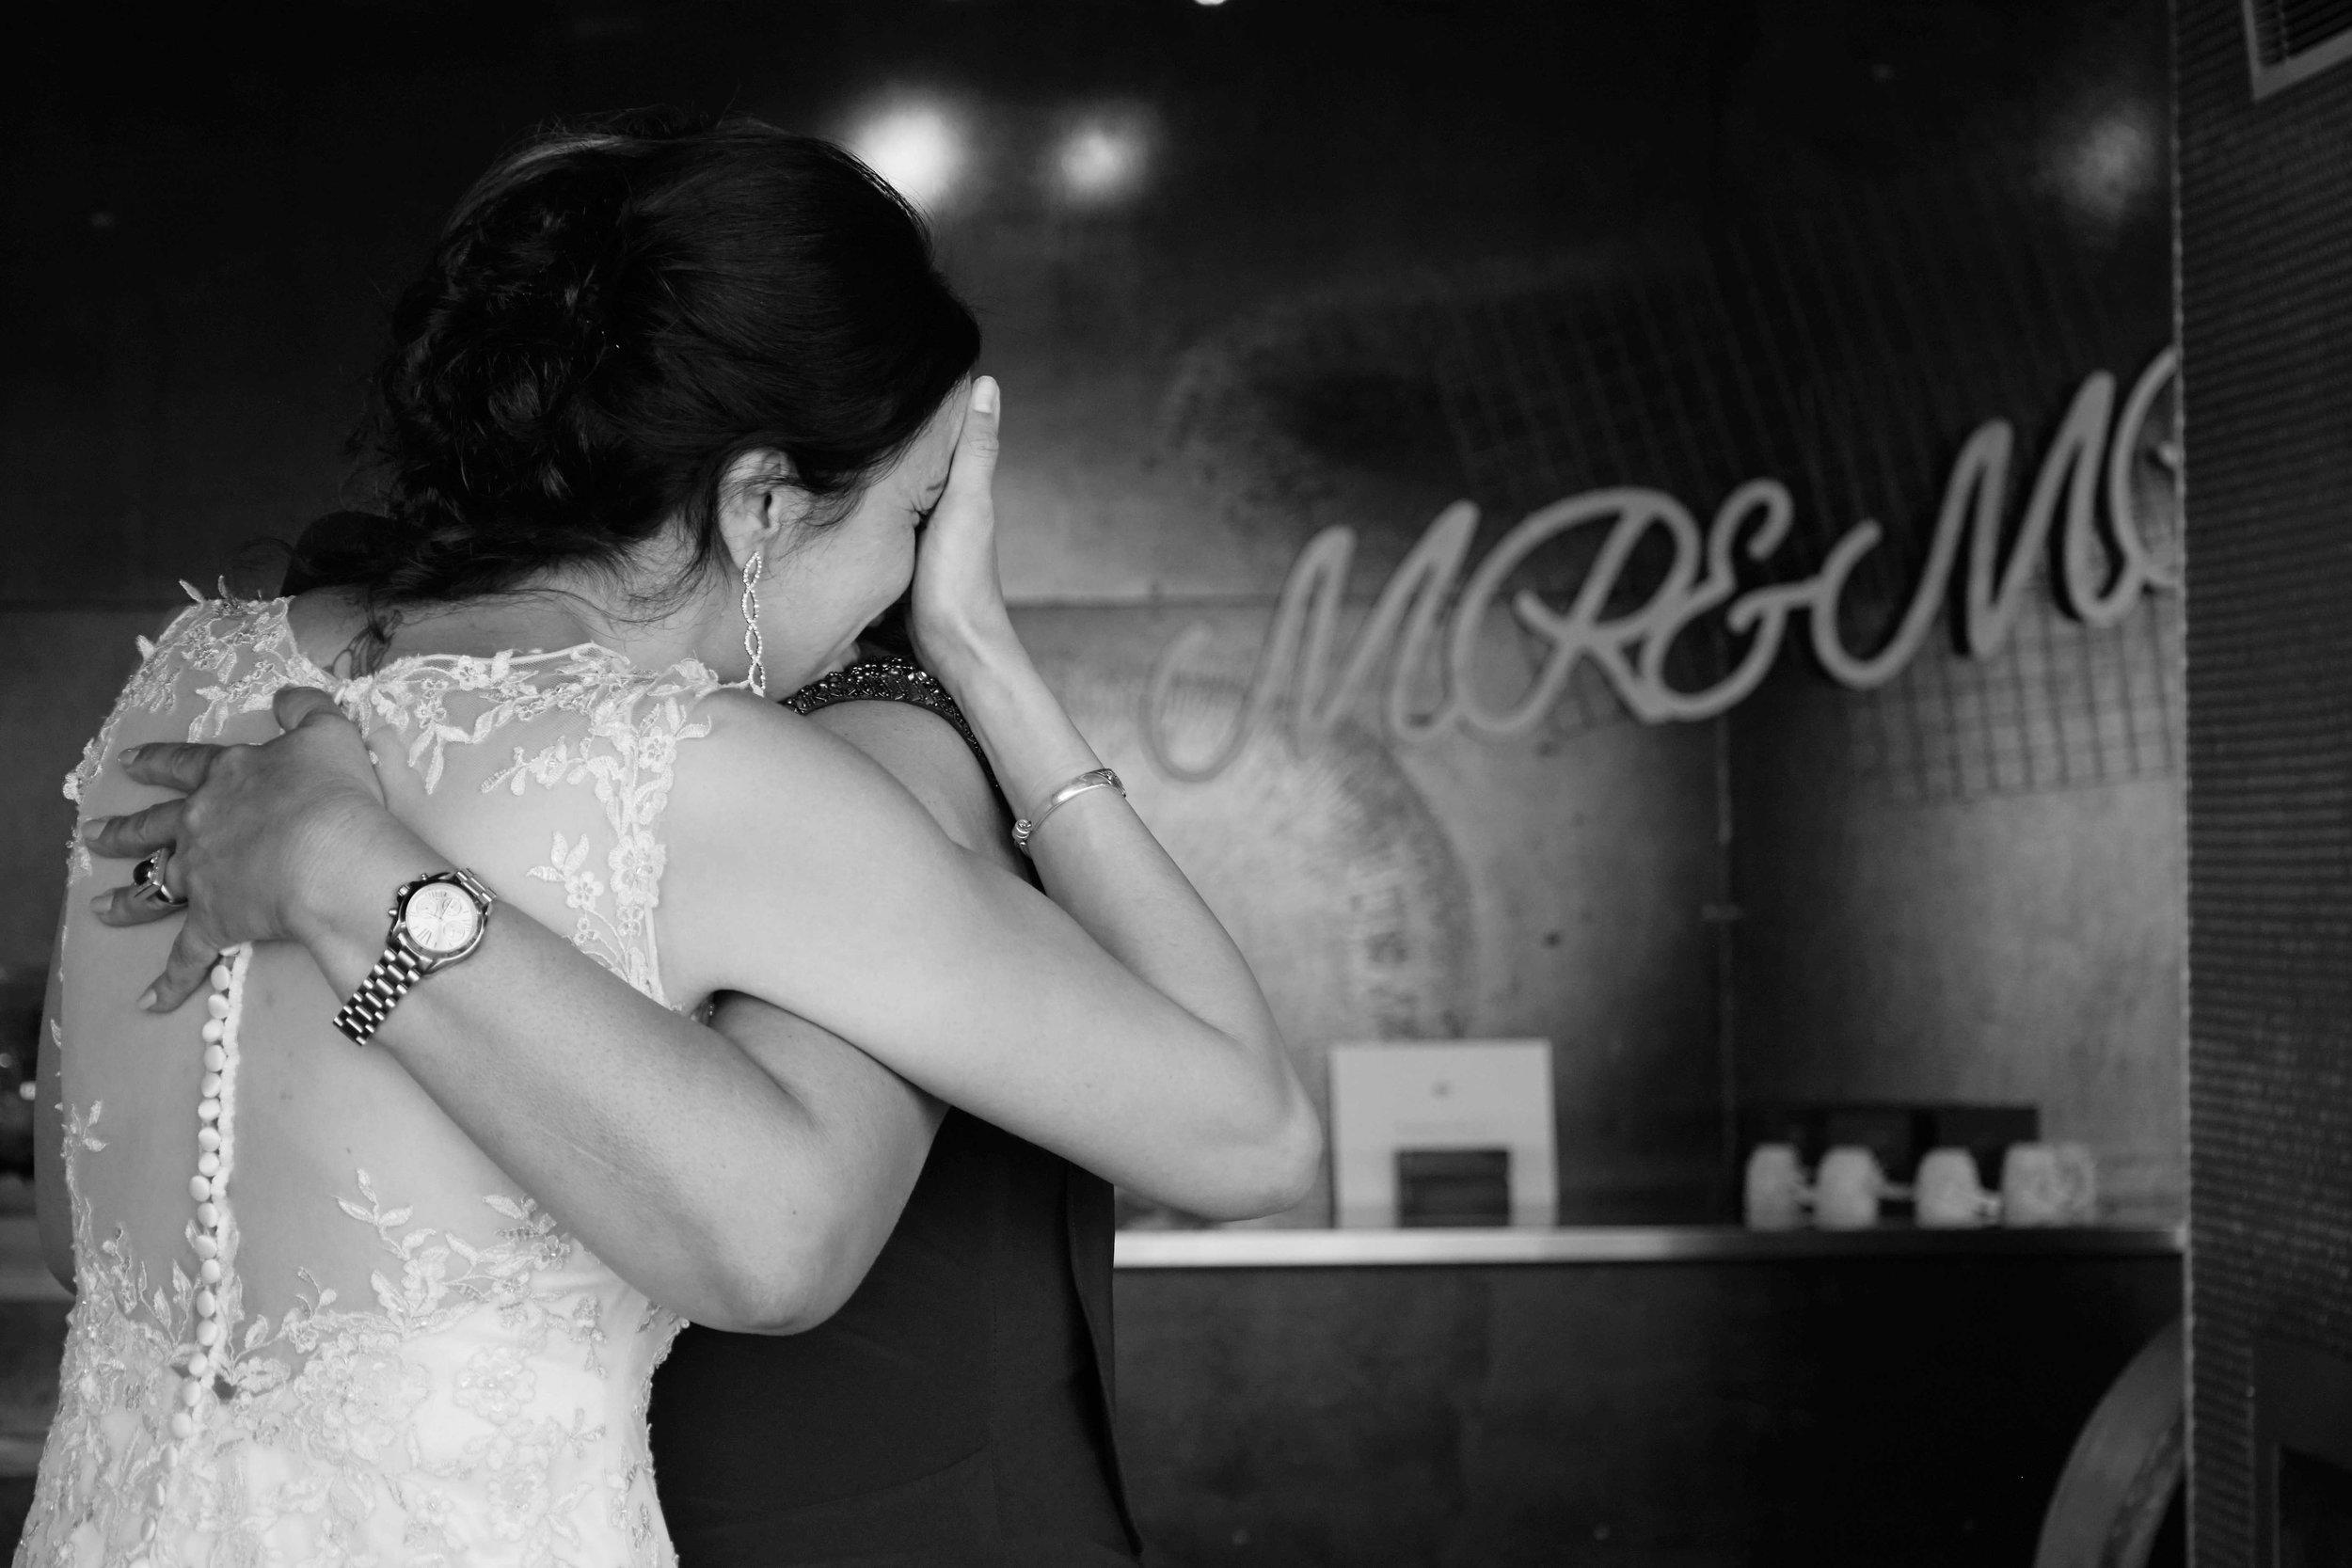 sorrento-wedding-photography-all-smiles-marissa-jade-photography-99.jpg